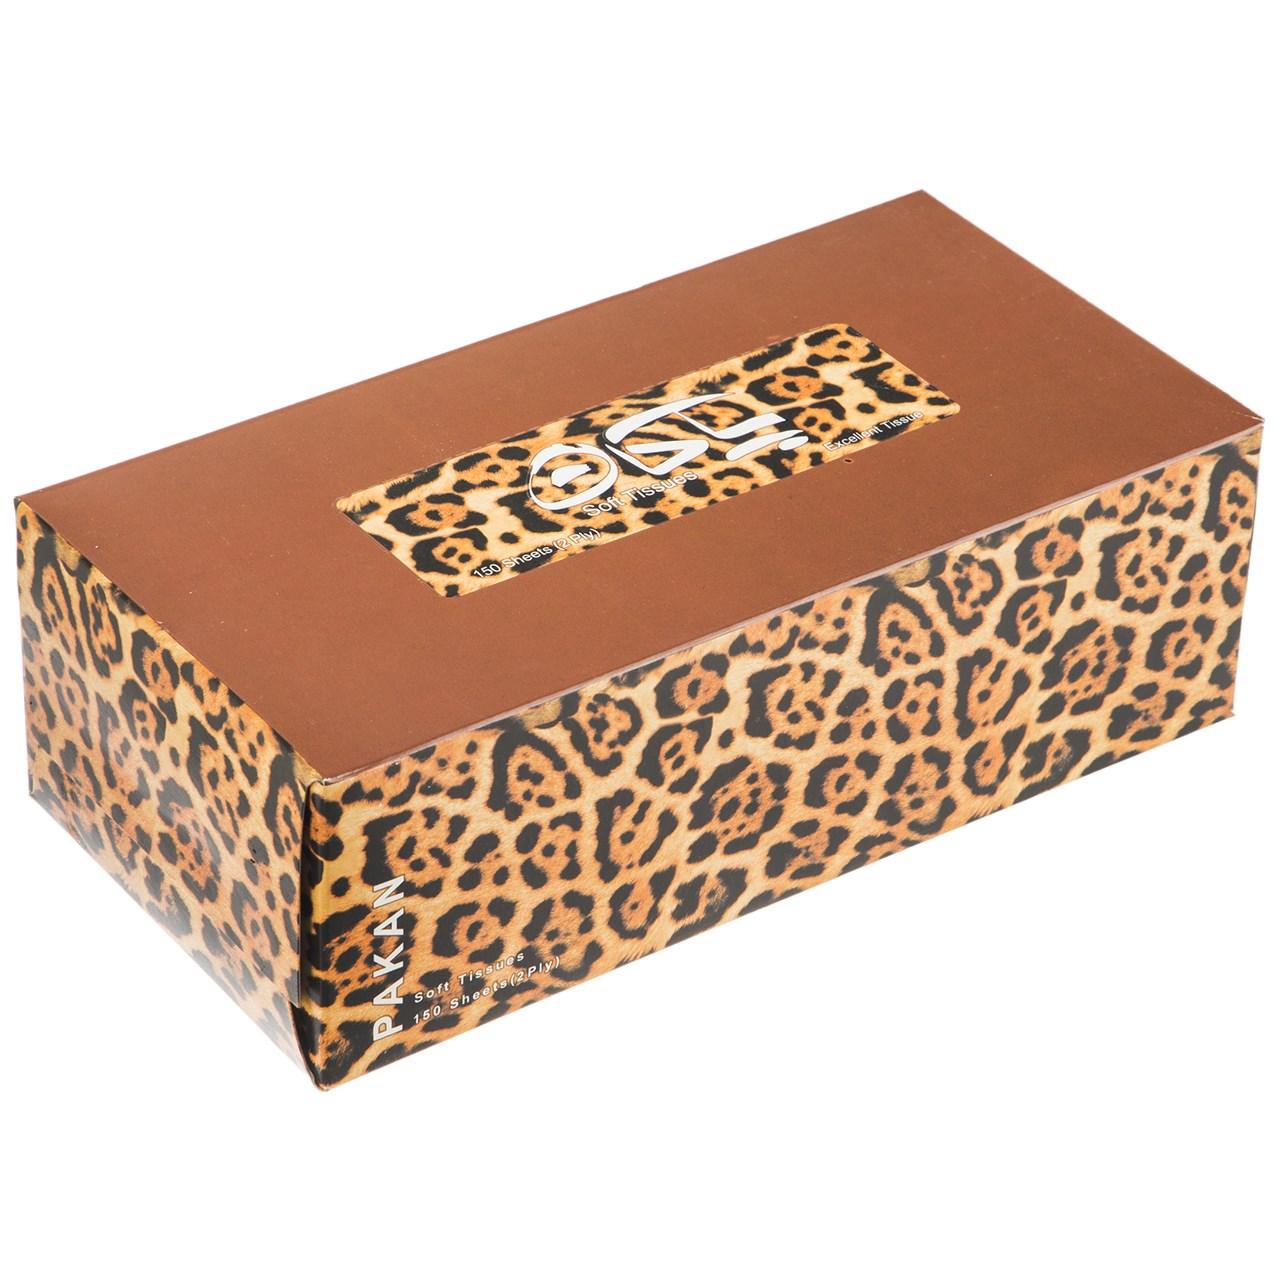 دستمال کاغذی 150 برگ پاکان مدل Leopard